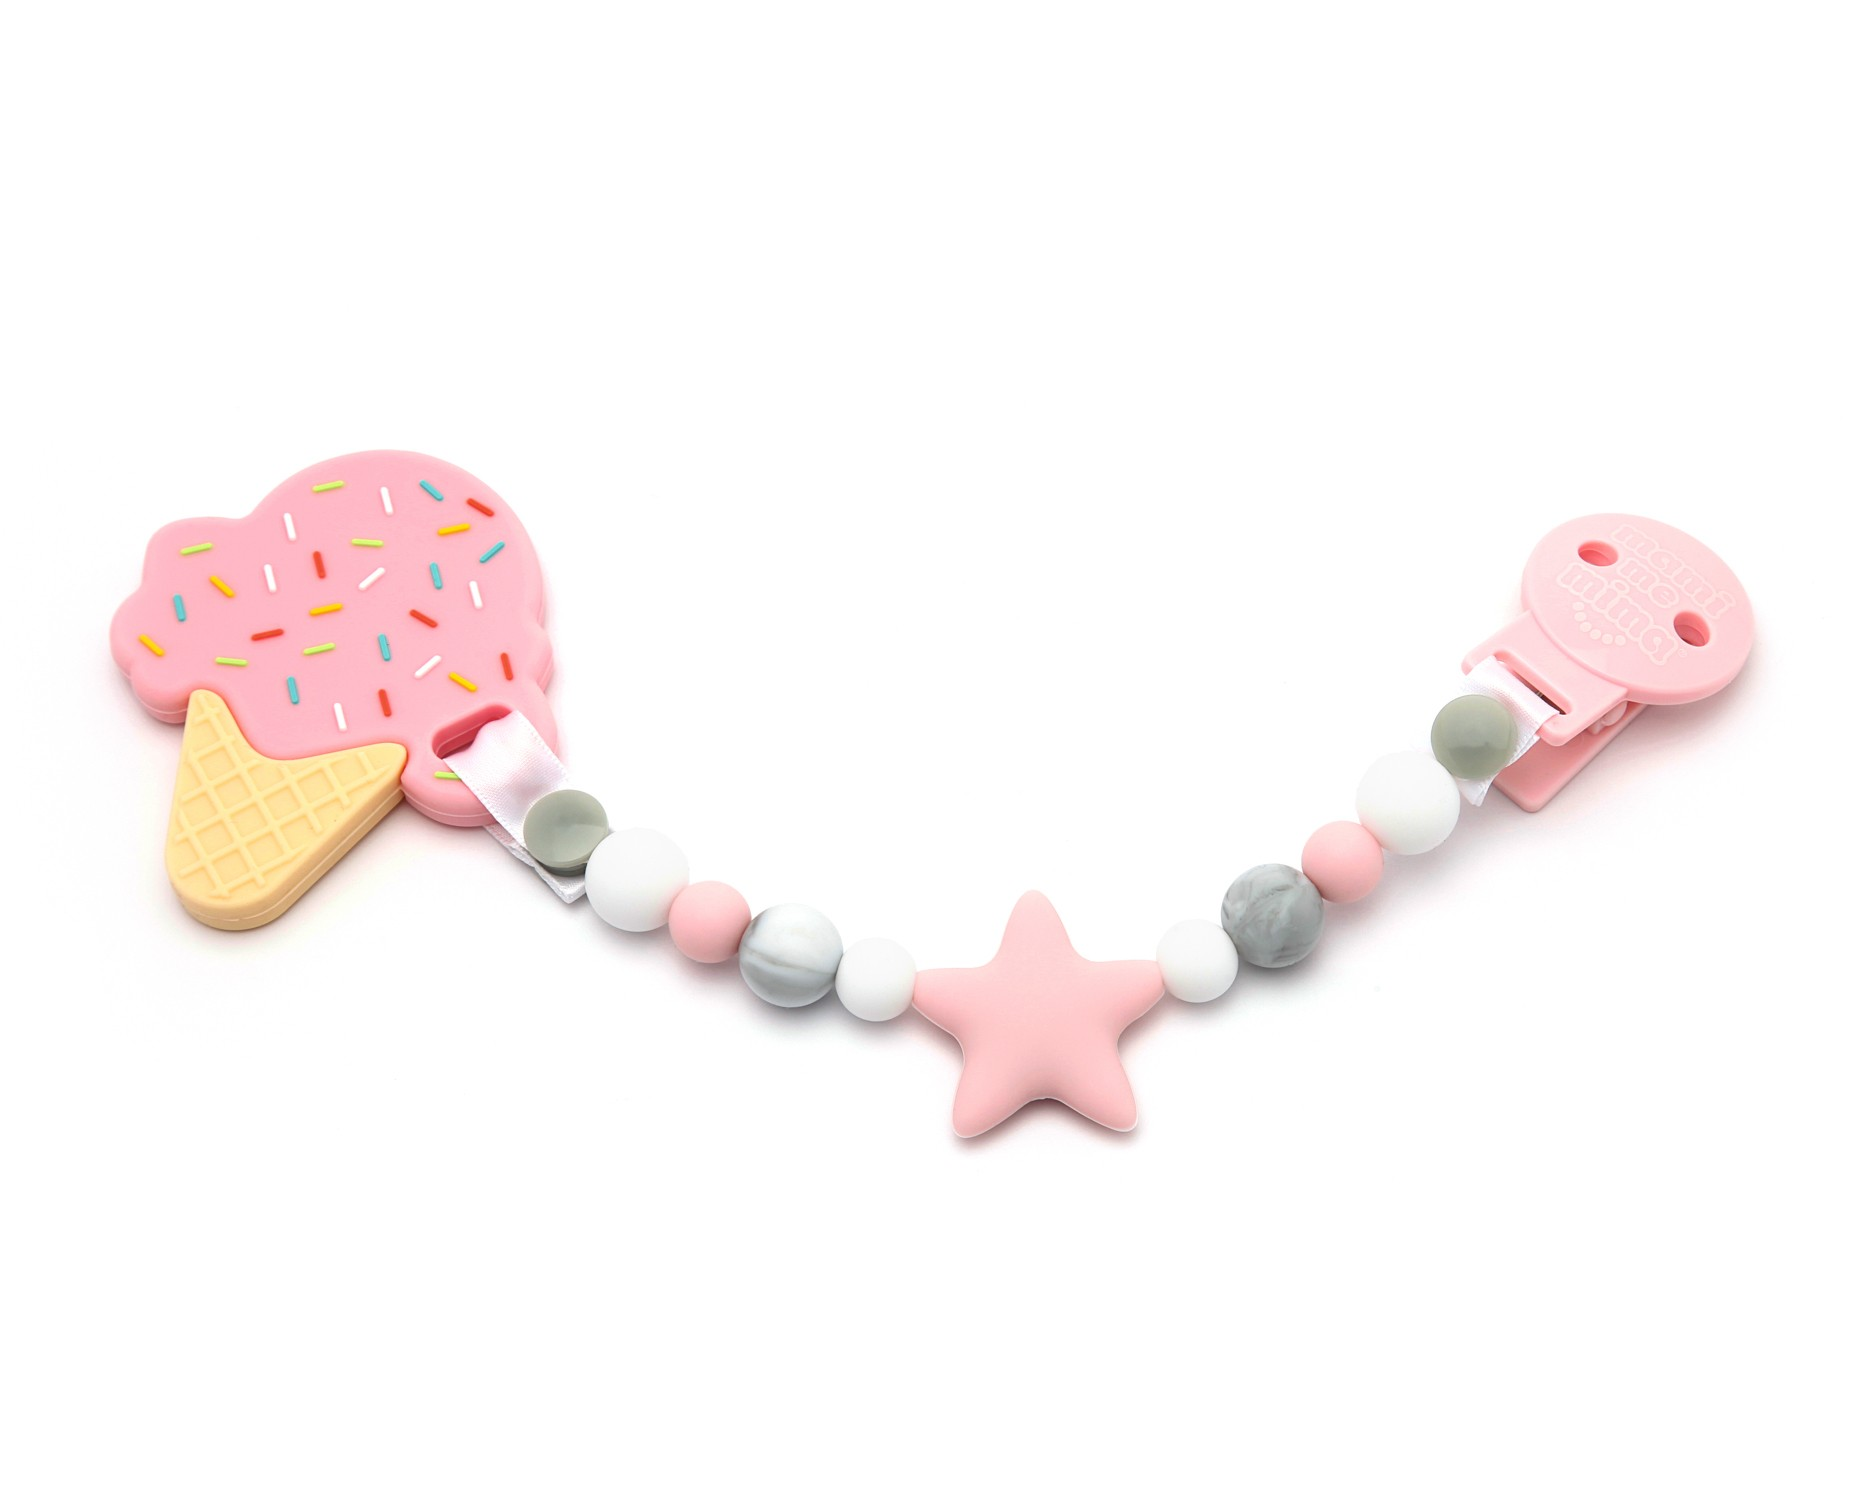 Pack Sujeta Chupetes Mordedor de Silicona Sweet Star Pink + Mordedor Ice Cream Pink